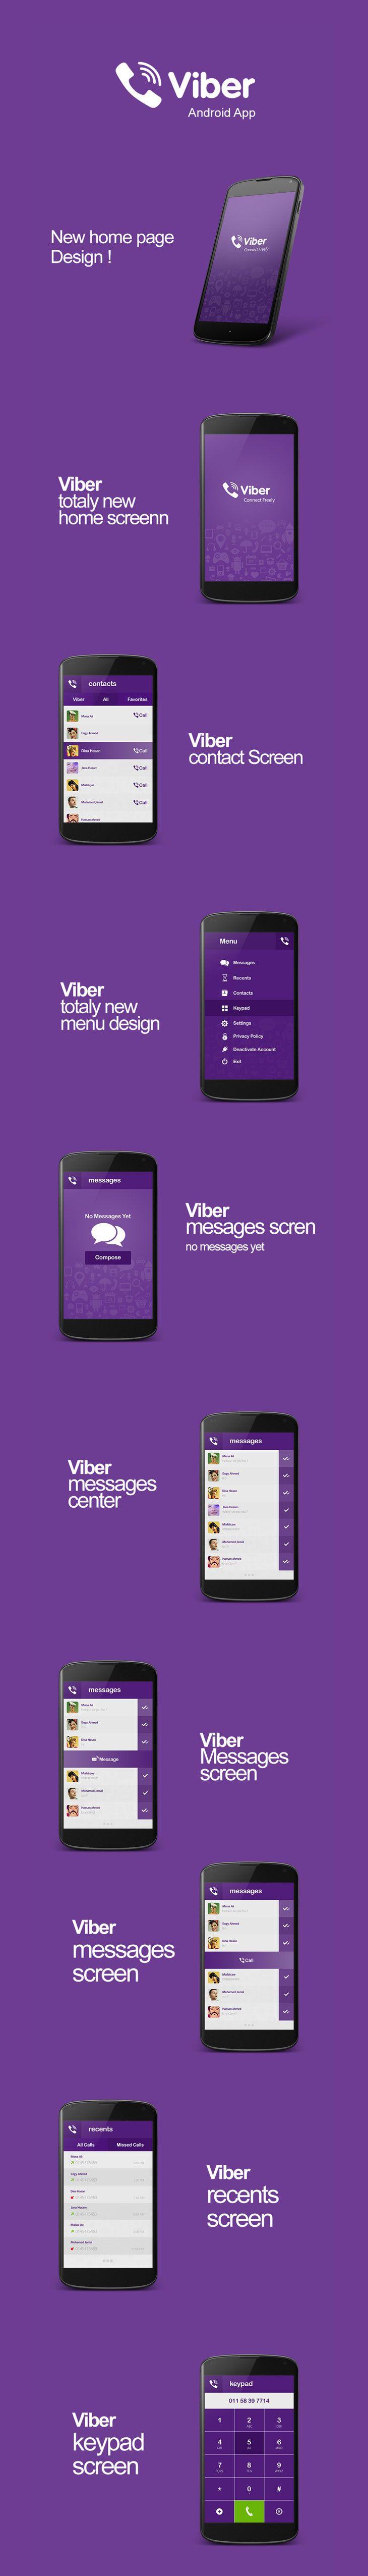 Viber 안드로이드 애플 리케이션 재 설계